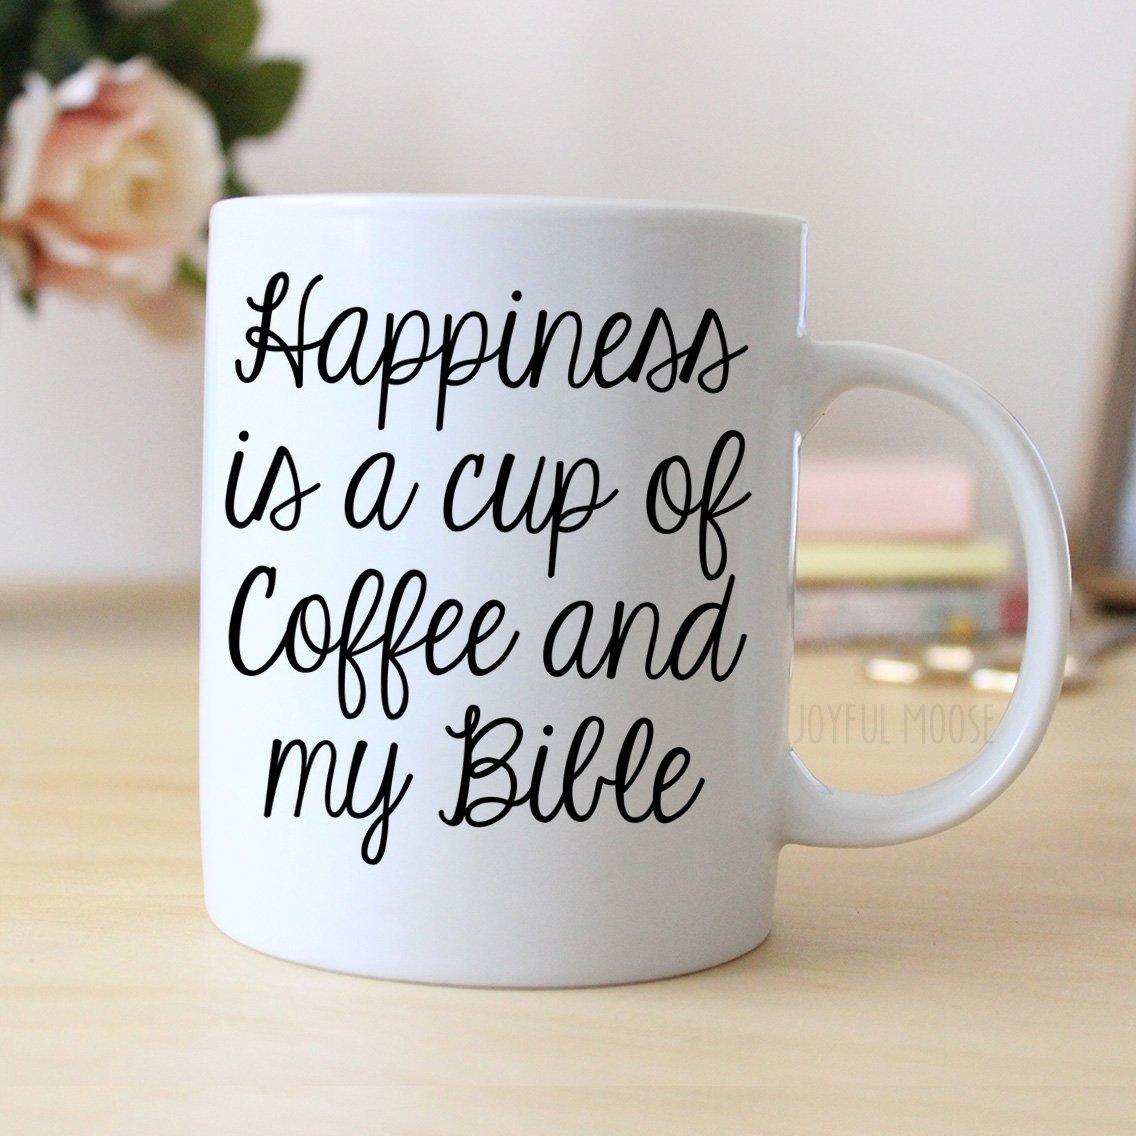 Happiness is a cup of coffee & my bible mug by Joyful Moose